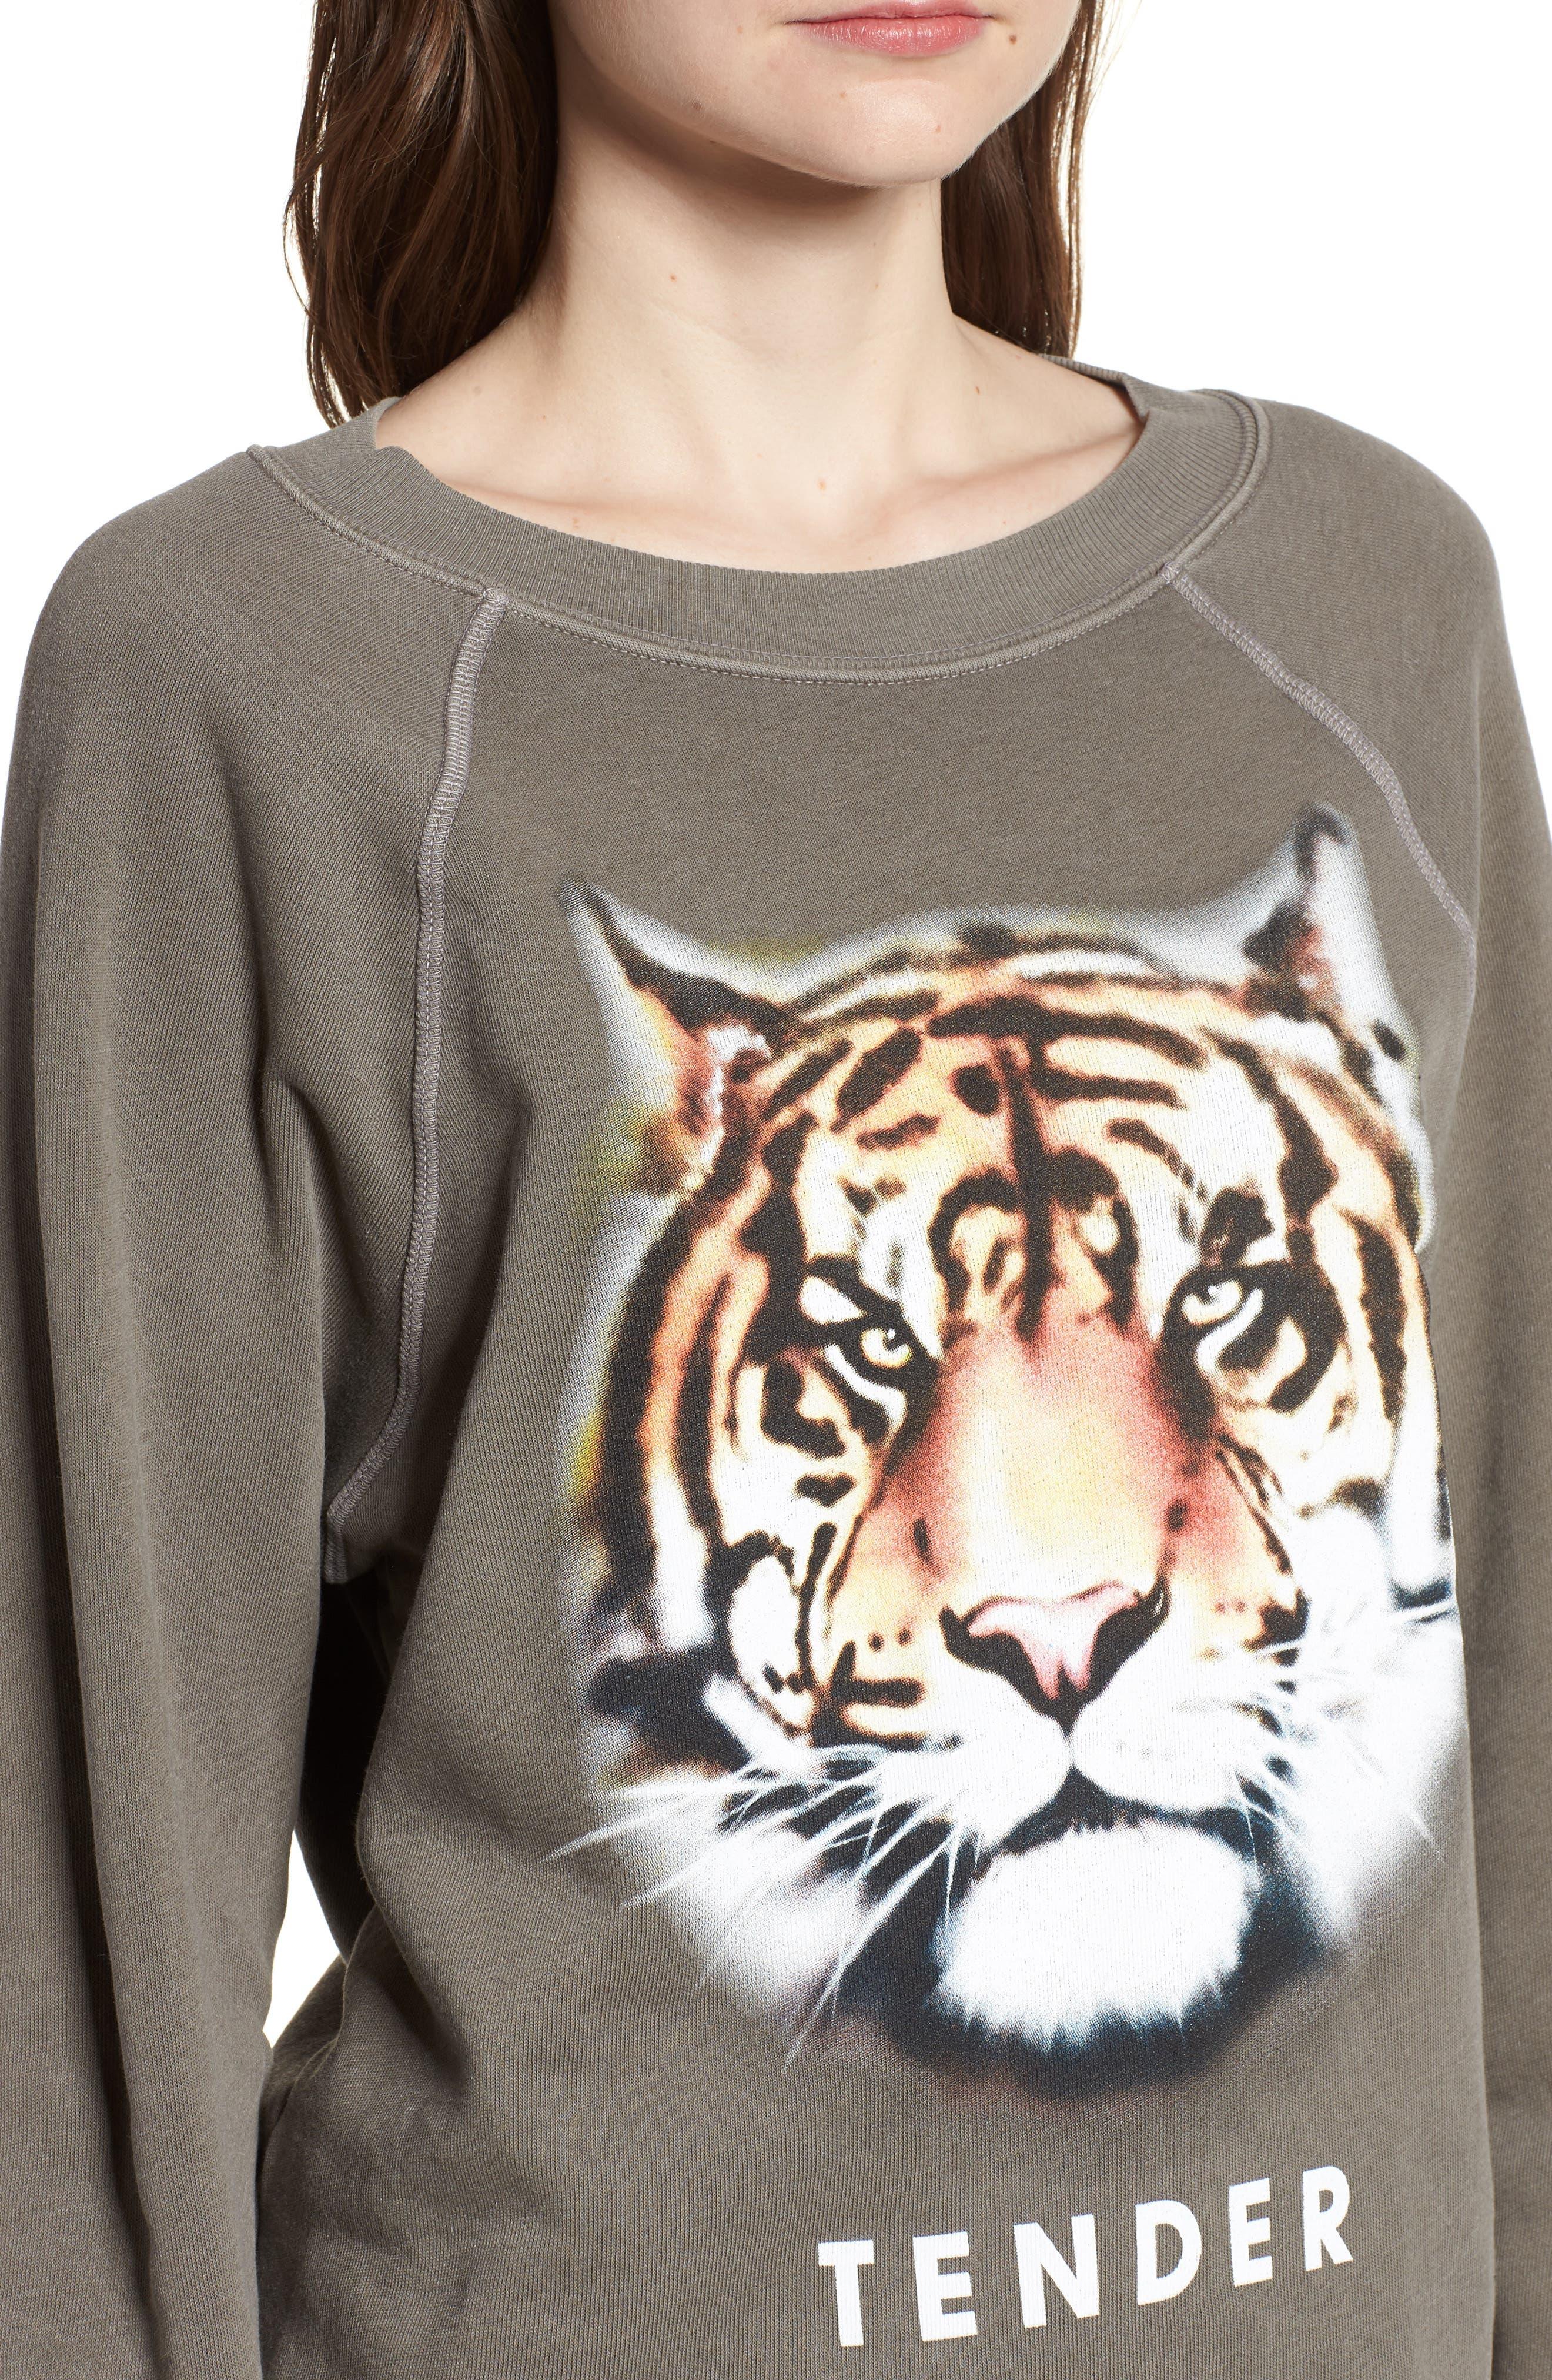 Tender - Sommers Sweatshirt,                             Alternate thumbnail 4, color,